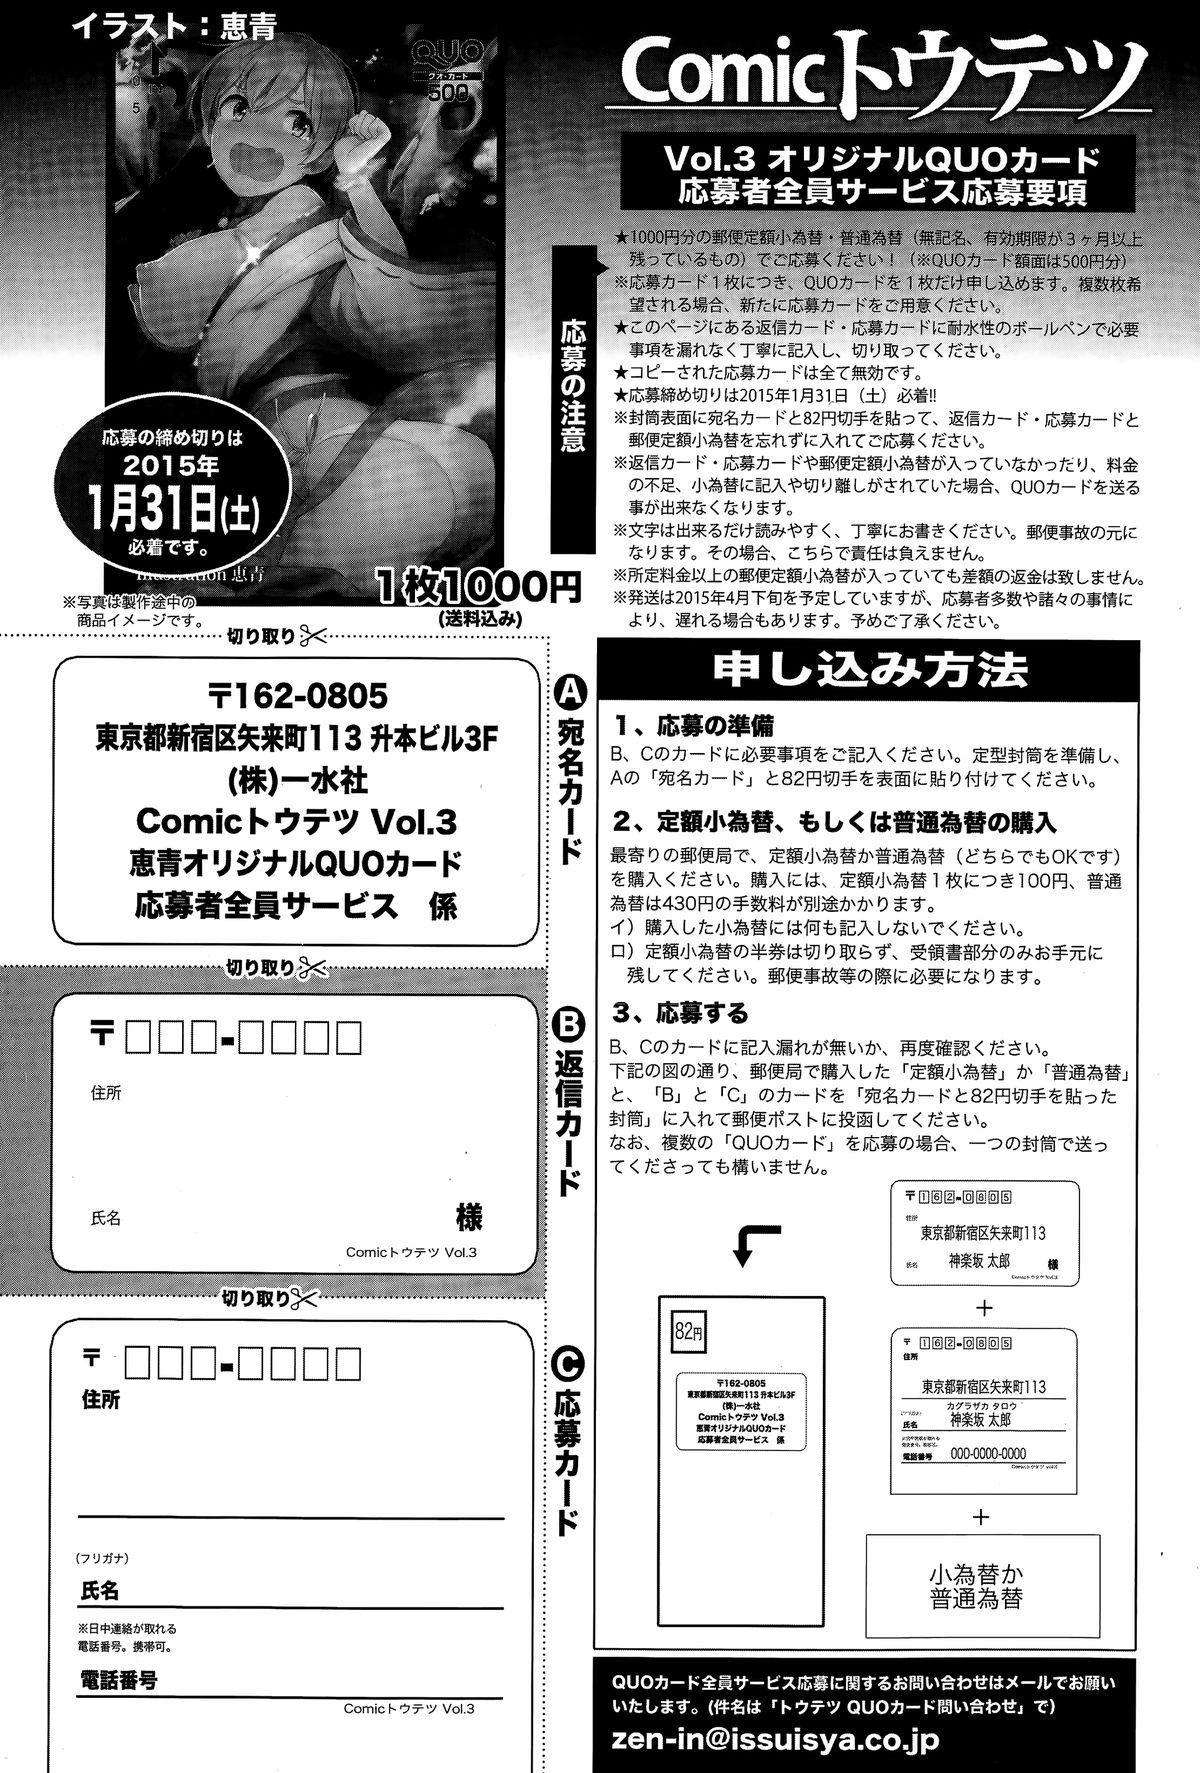 Comic Toutetsu 2015-02 Vol. 3 234